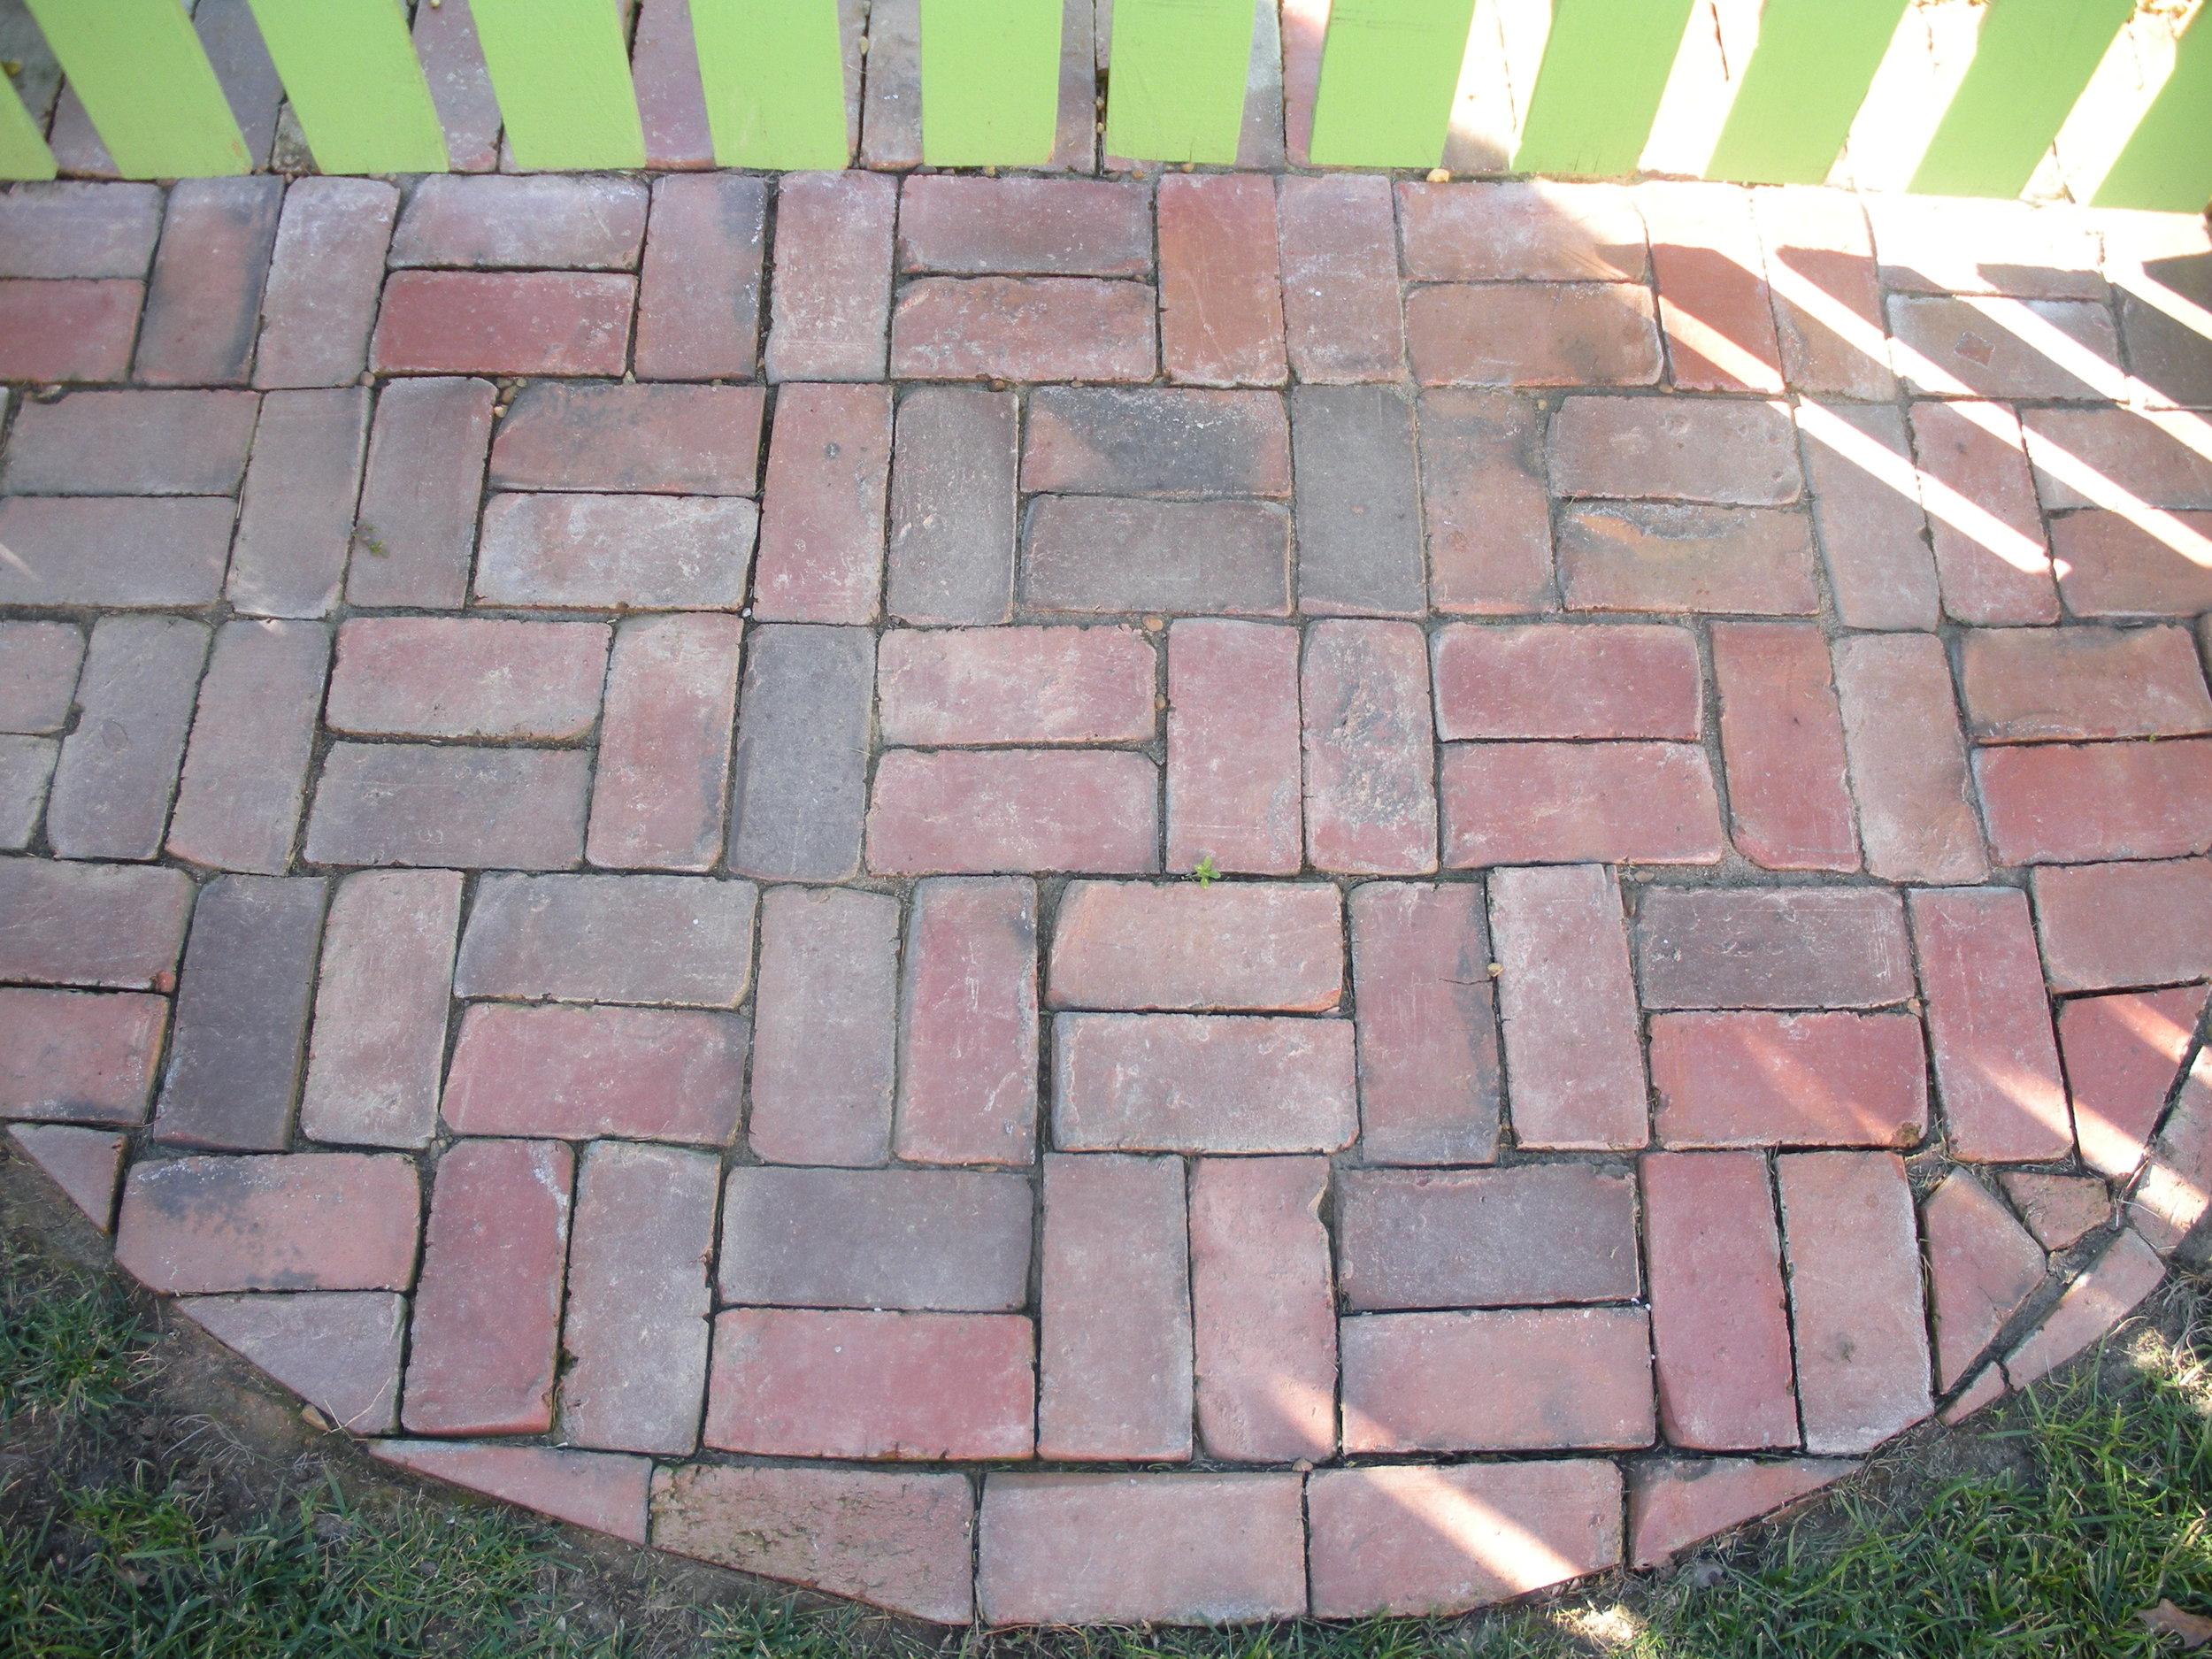 Brick landing for entrance to garden room